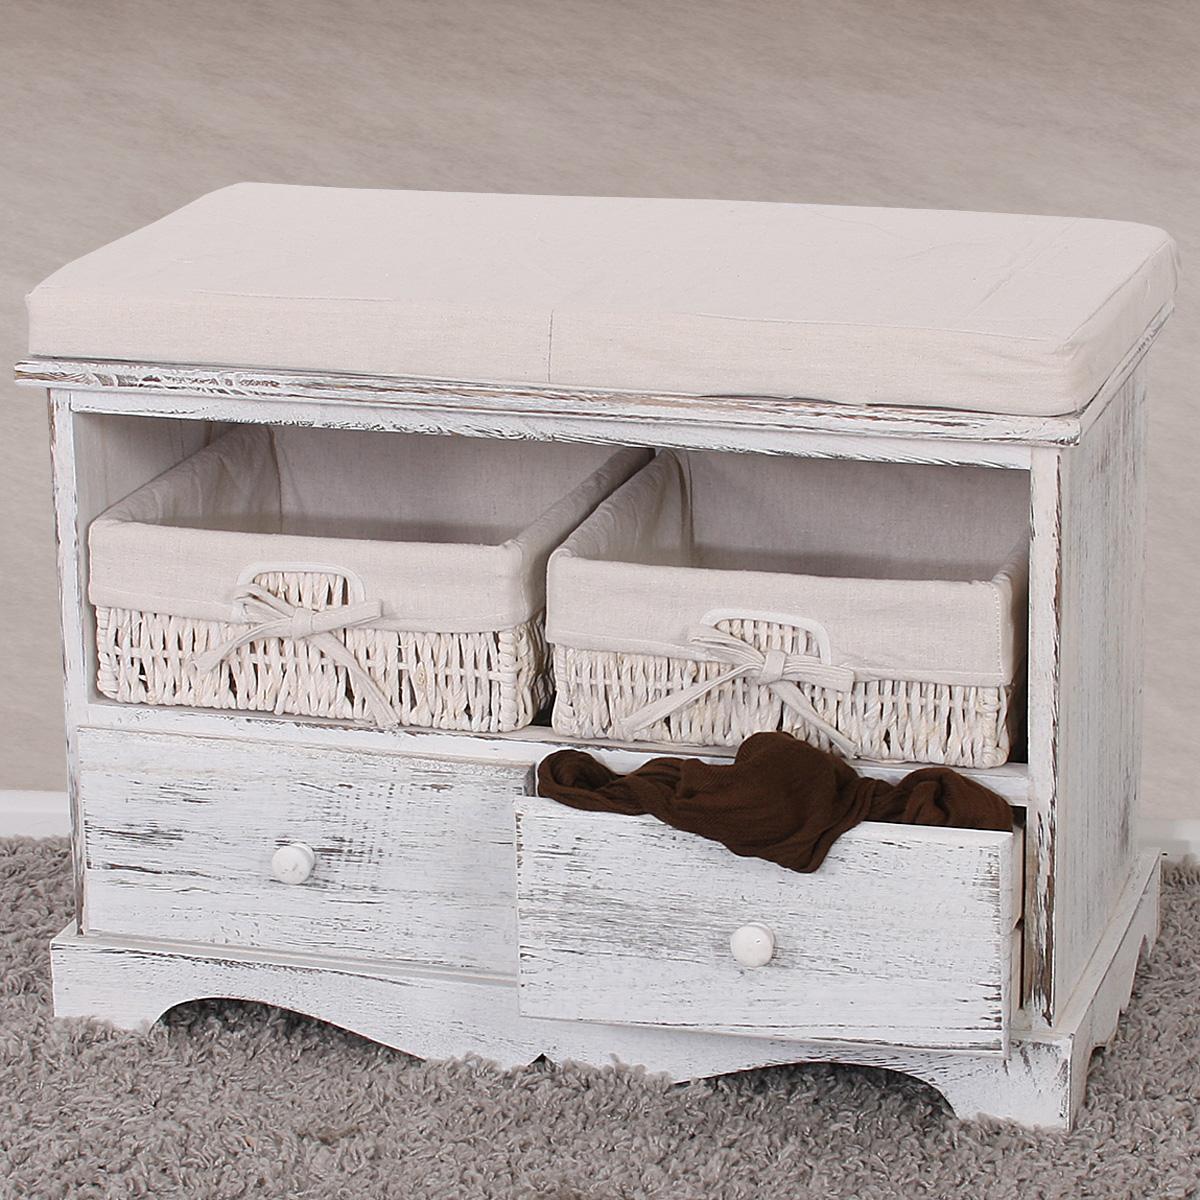 sitzbank kommode mit 2 k rben garderobe shabby look vintage wei braun grau ebay. Black Bedroom Furniture Sets. Home Design Ideas